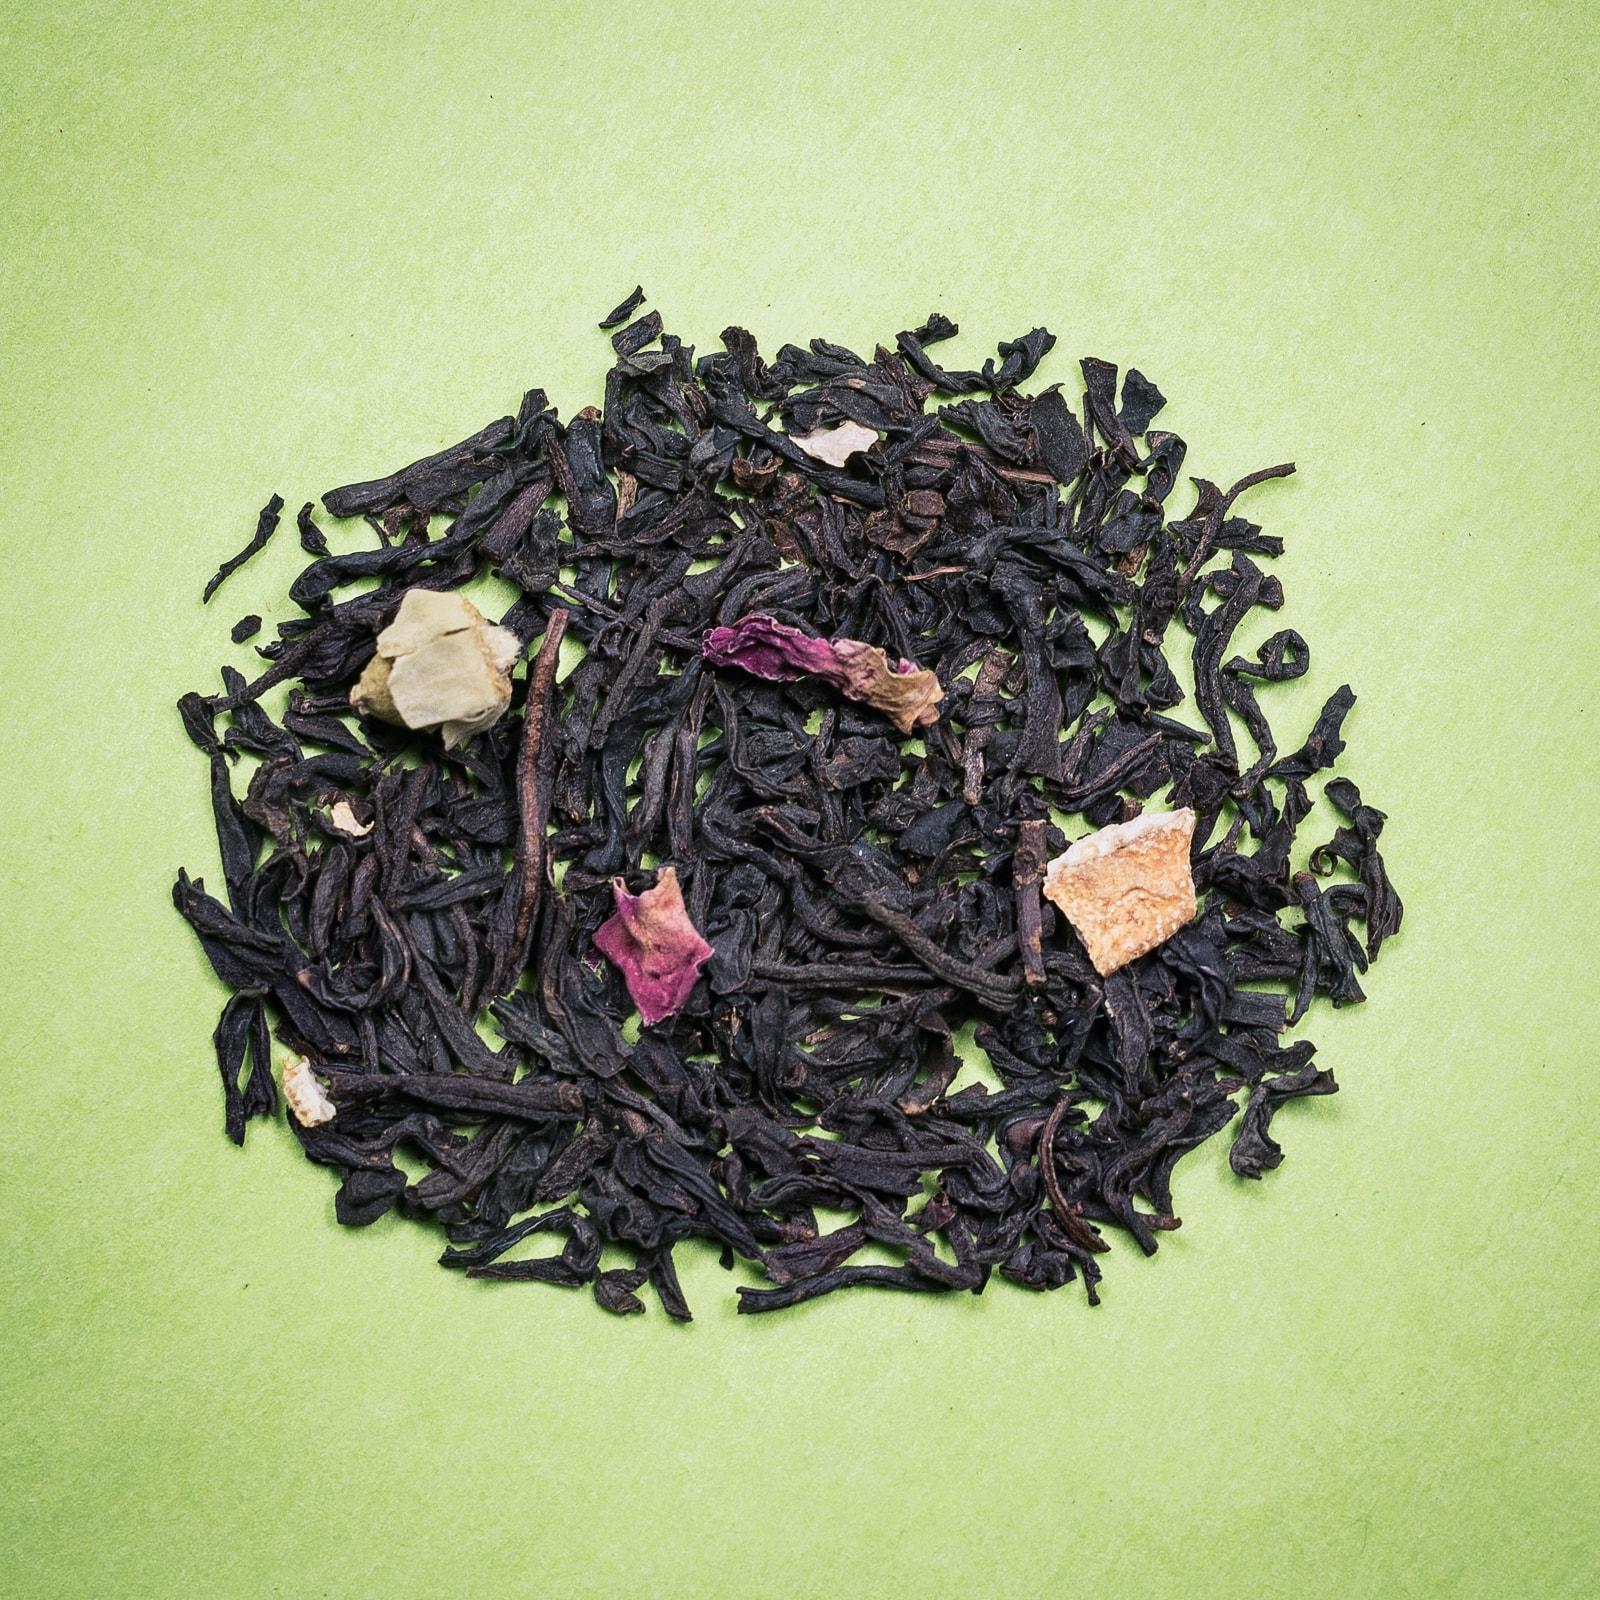 Anbassa-artisan-torrefacteur-the-noir-aromatise-Serenite-GUP